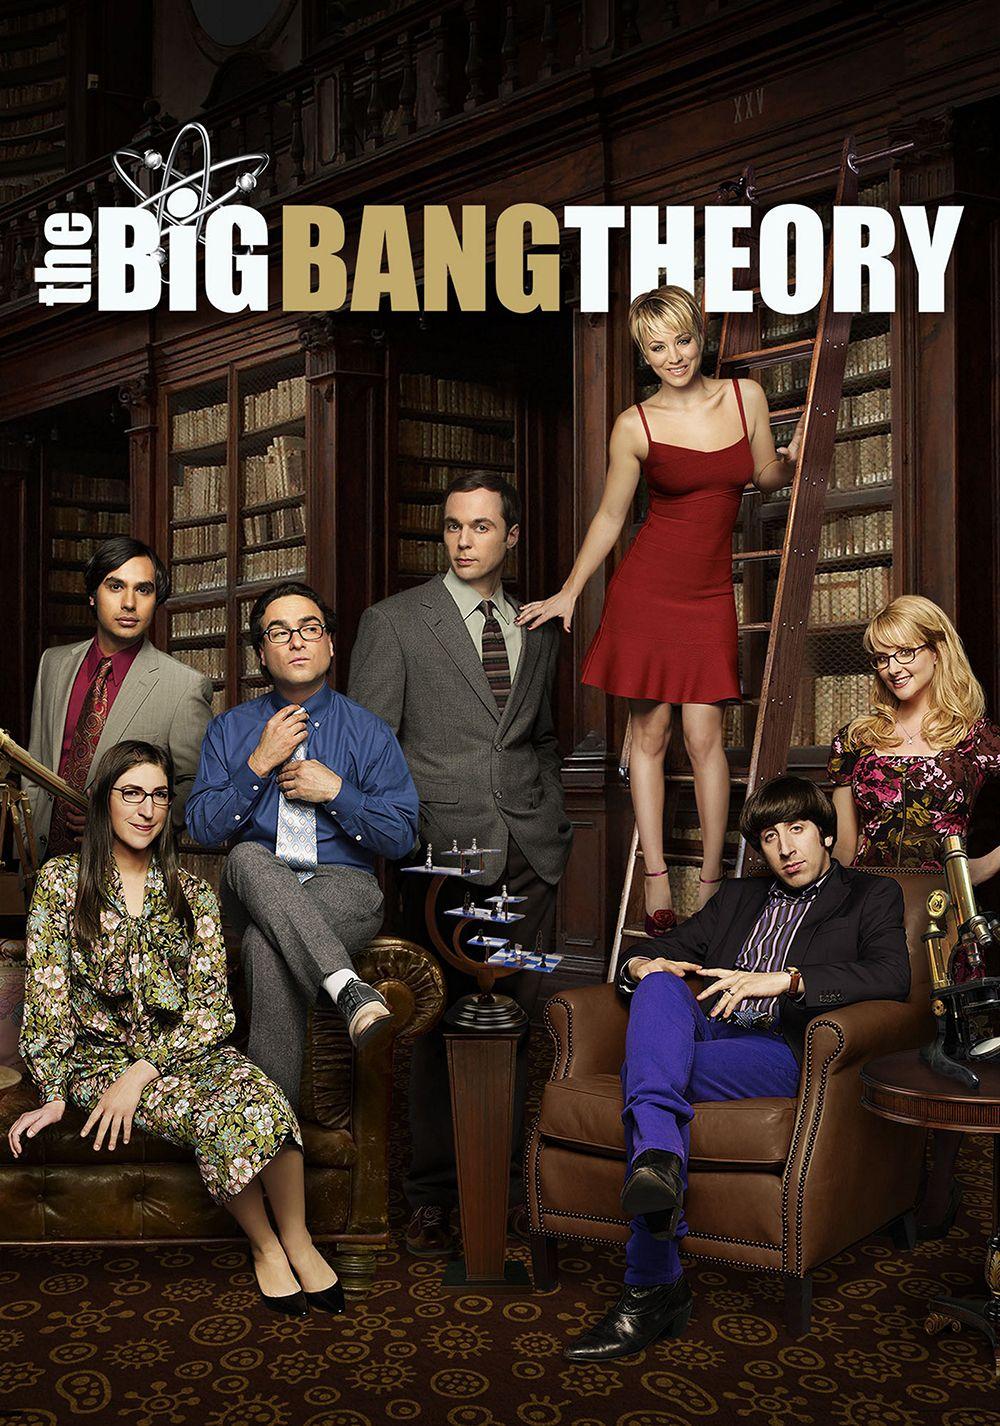 The Big Bang Theory 9 Sezon 8 Bölüm <The Mystery Date Observation> fragmanı yayınlandı..   #dizitakip #fragman #TheBigBangTheory